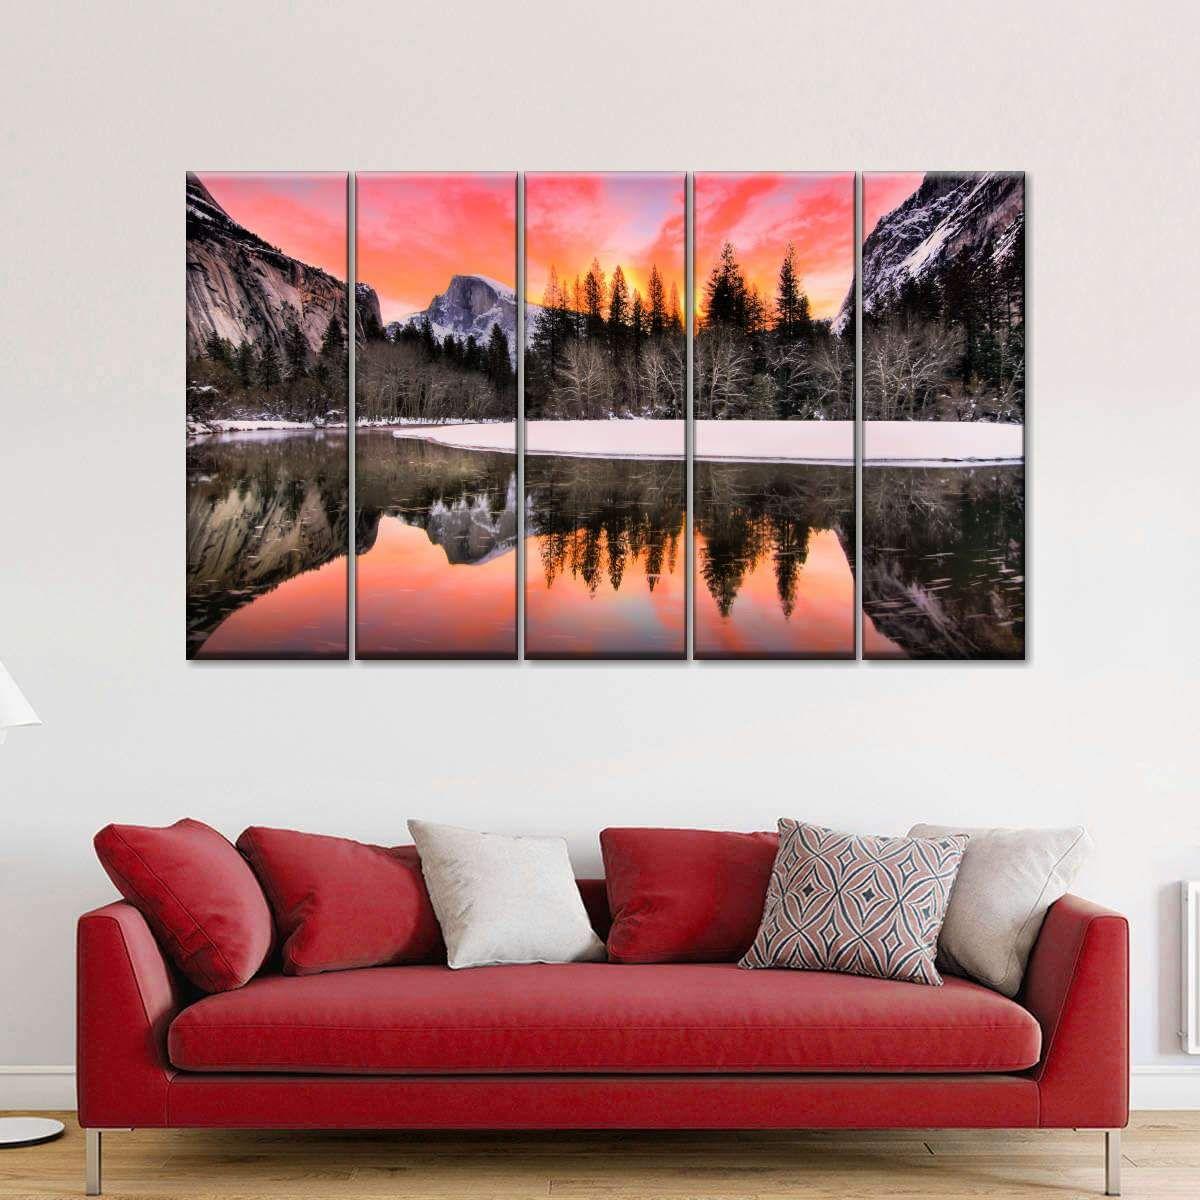 Yosemite National Park Twilight Multi Panel Canvas Wall Art In 2020 Canvas Wall Art Multi Panel Canvas Canvas Decor